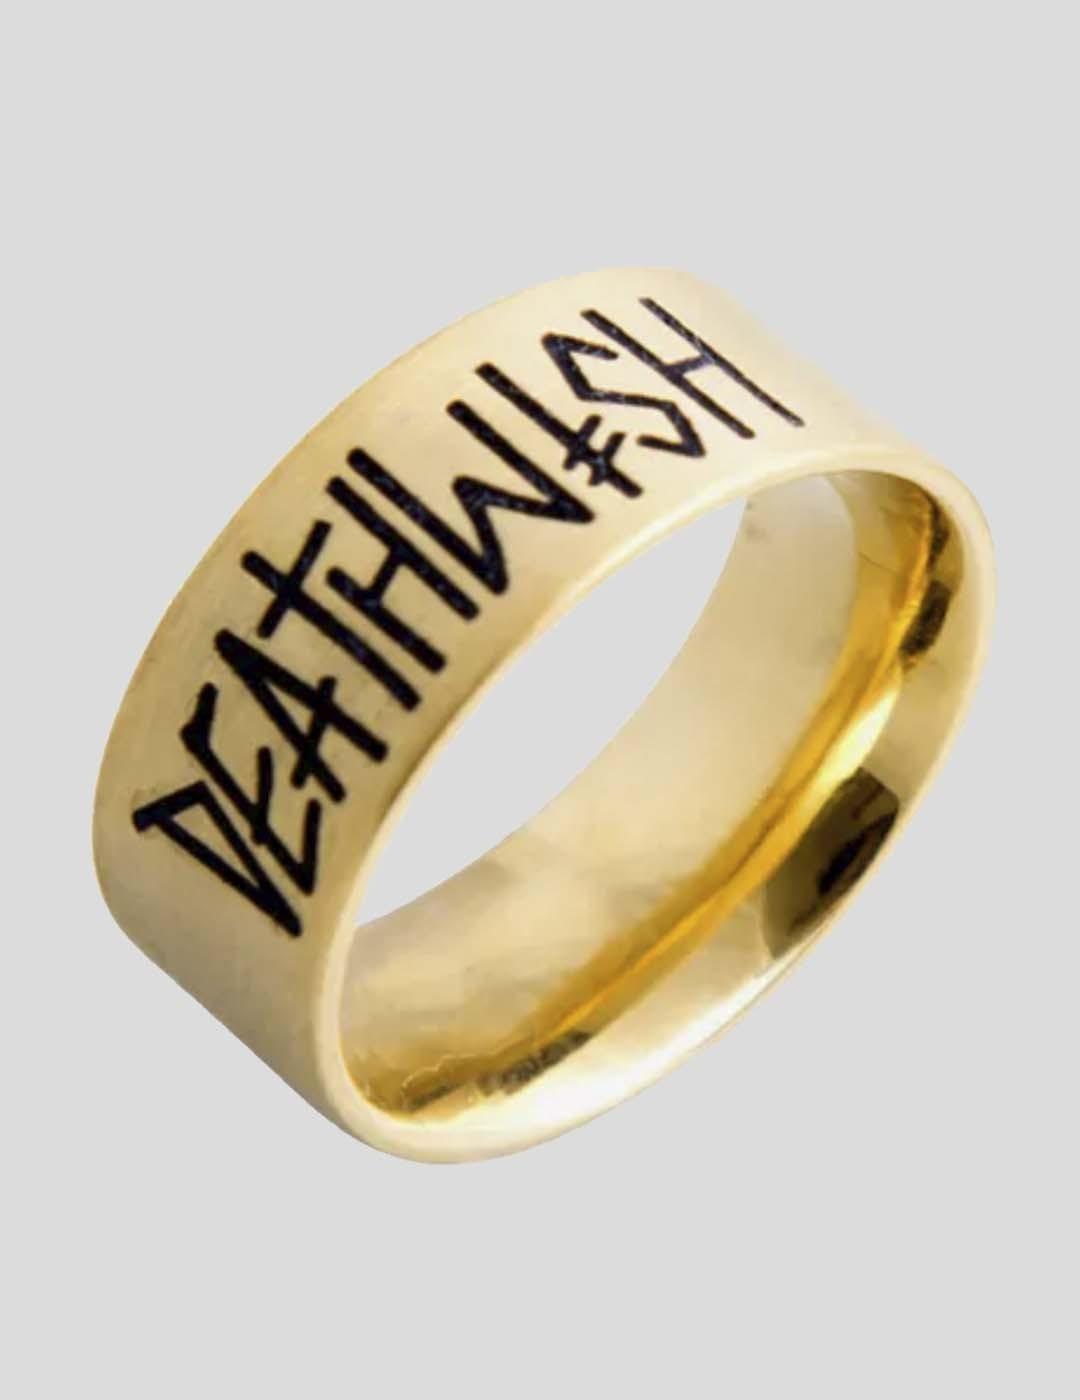 ANILLO DEATHWISH DEATHSPRAY GOLD RING  GOLD